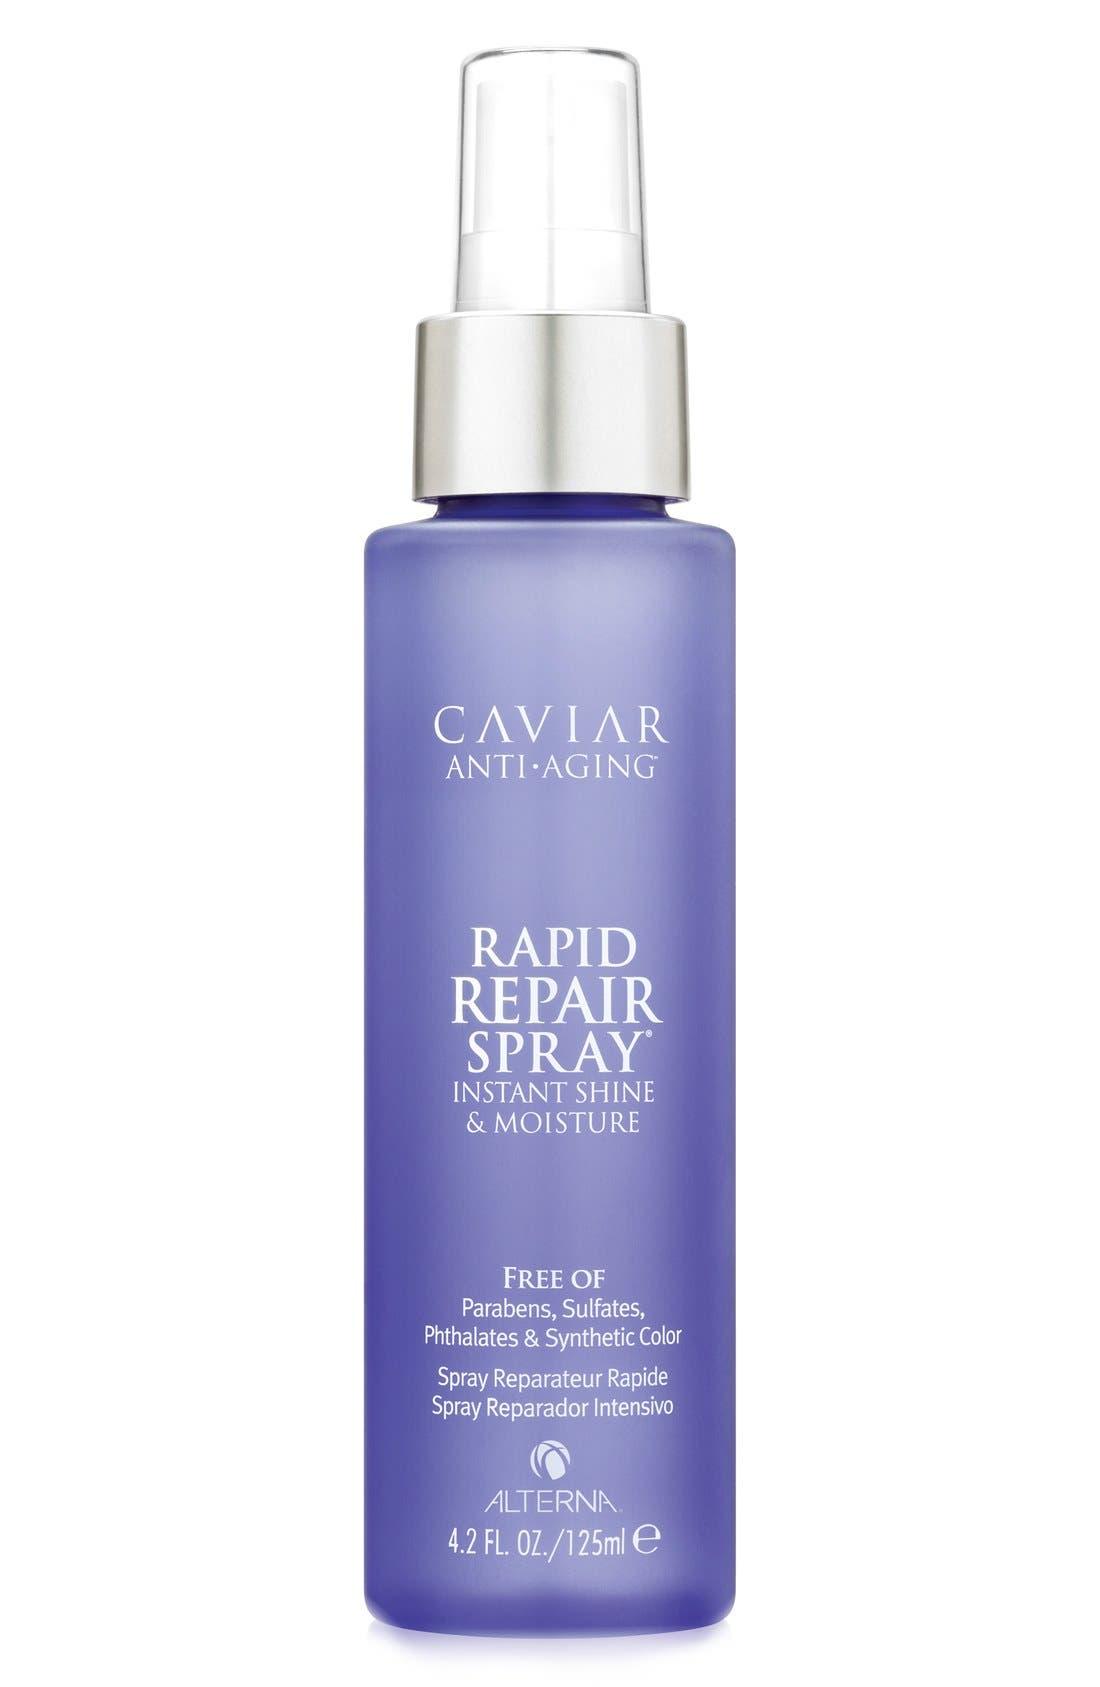 ALTERNA® Caviar Anti-Aging Rapid Repair Spray